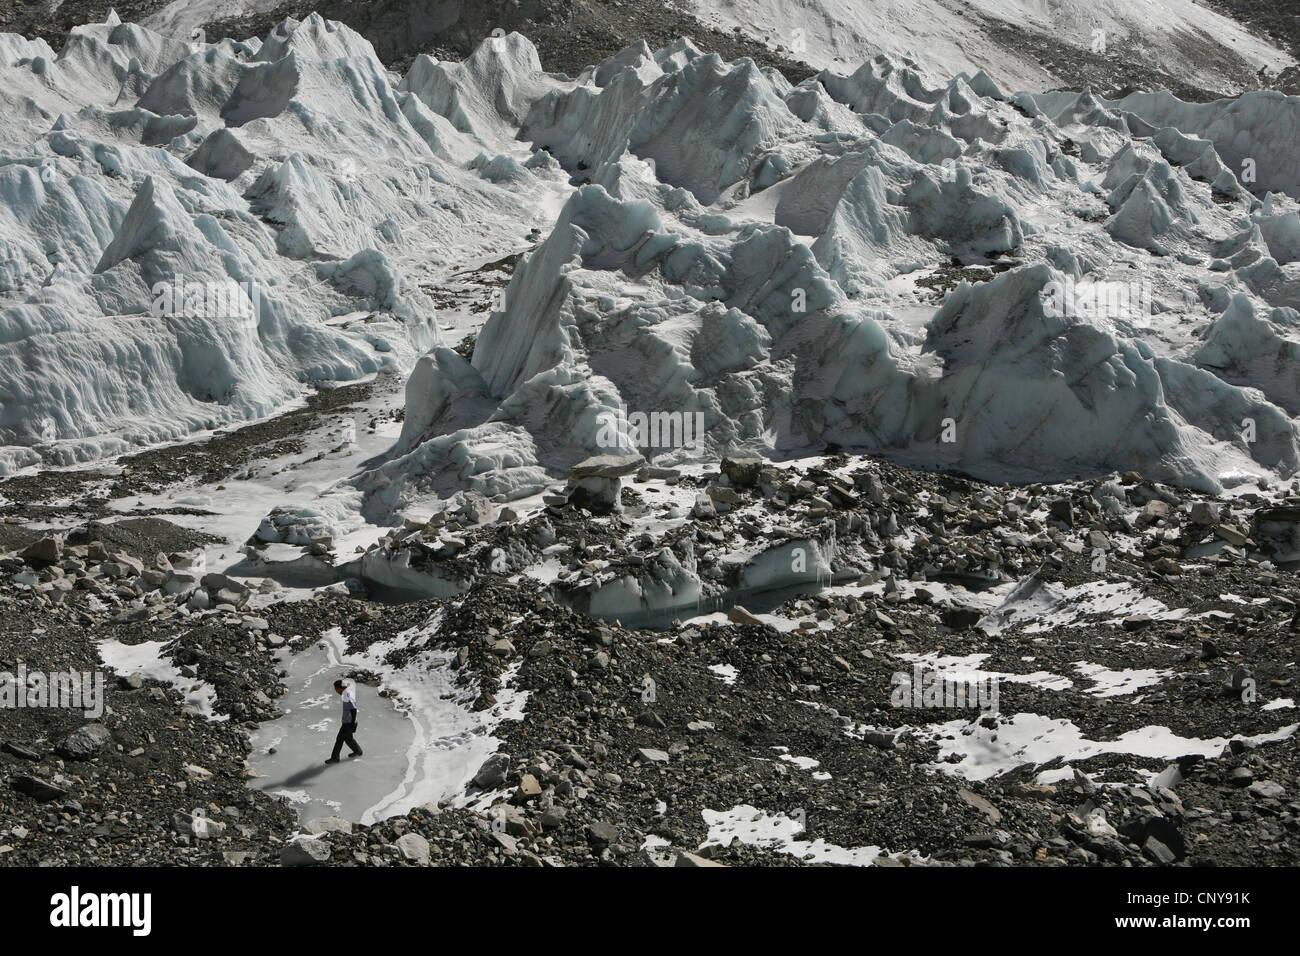 Khumbu glacier near the Everest Base Camp (5,364 m) in Khumbu region in the Himalayas, Nepal. - Stock Image